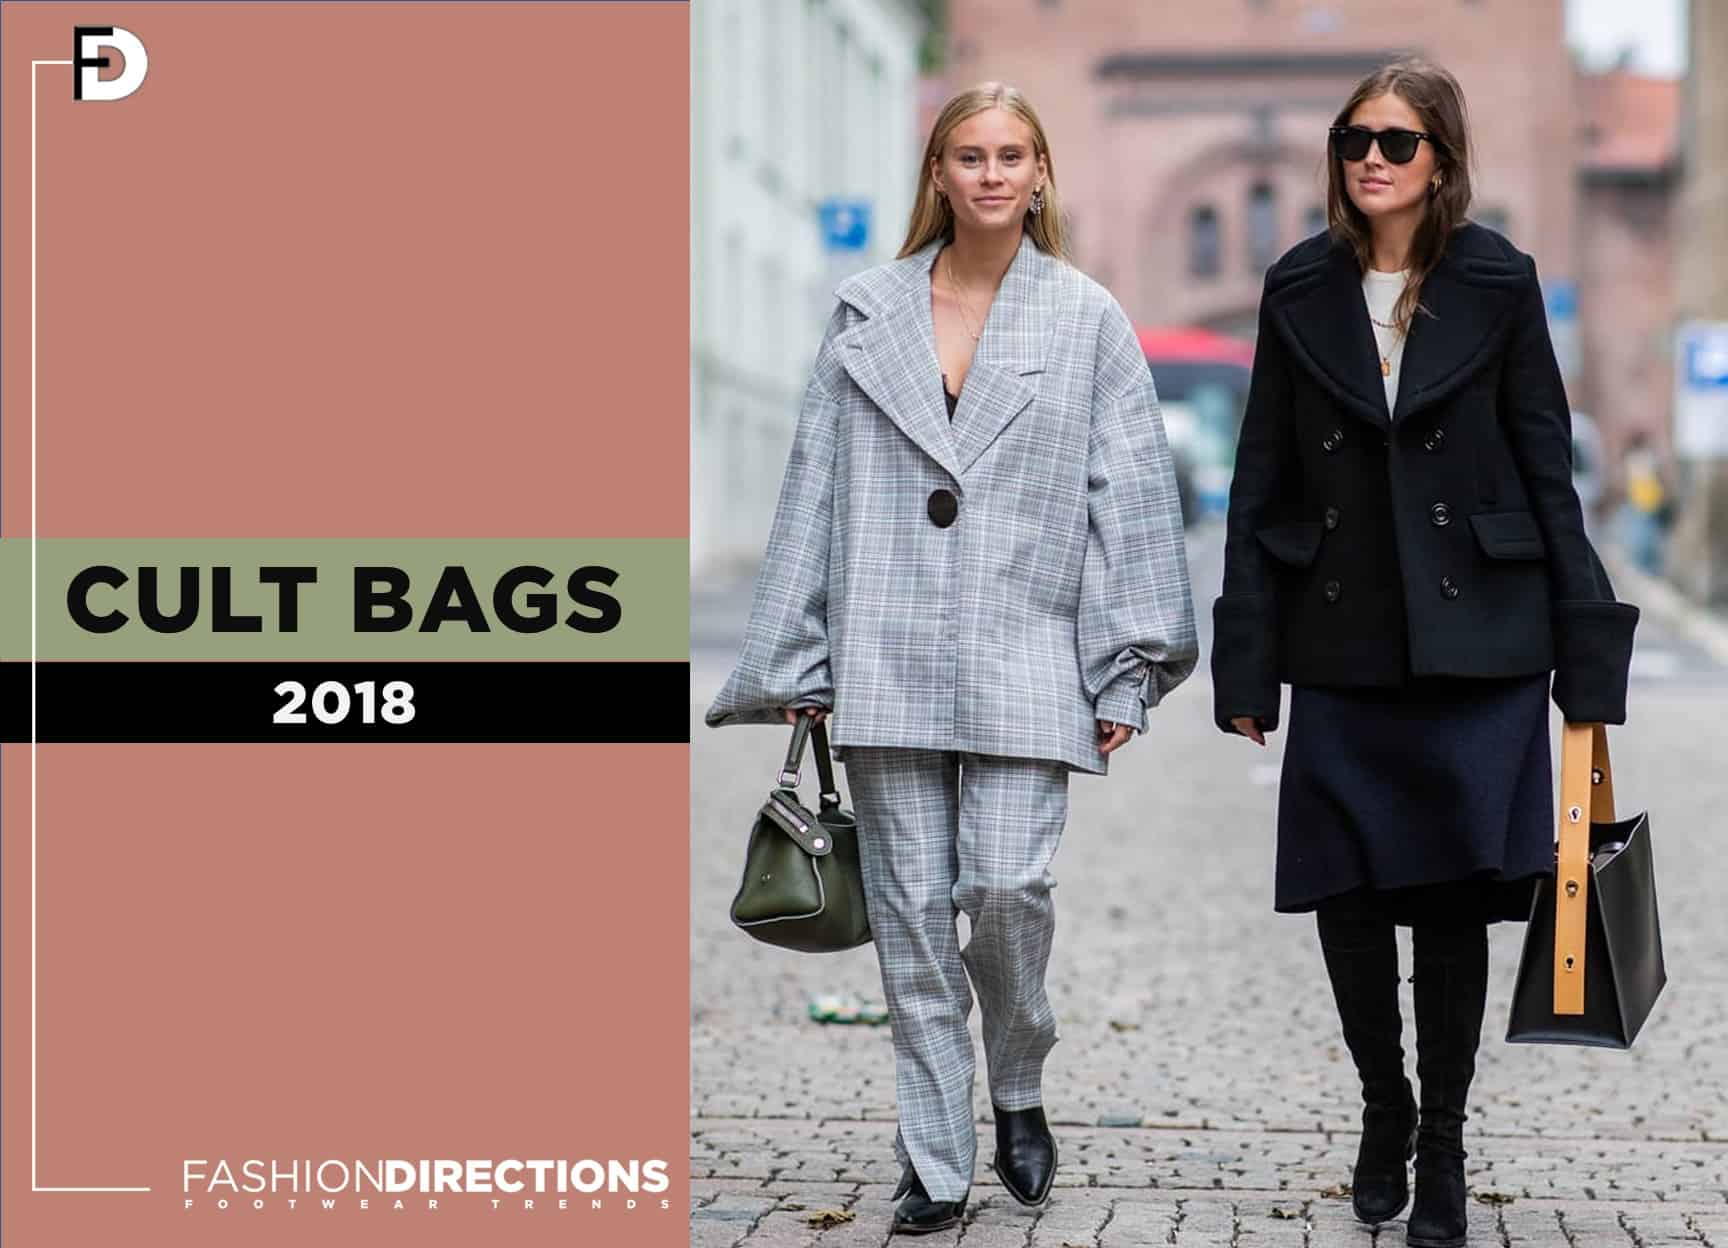 Cult Bags 2018